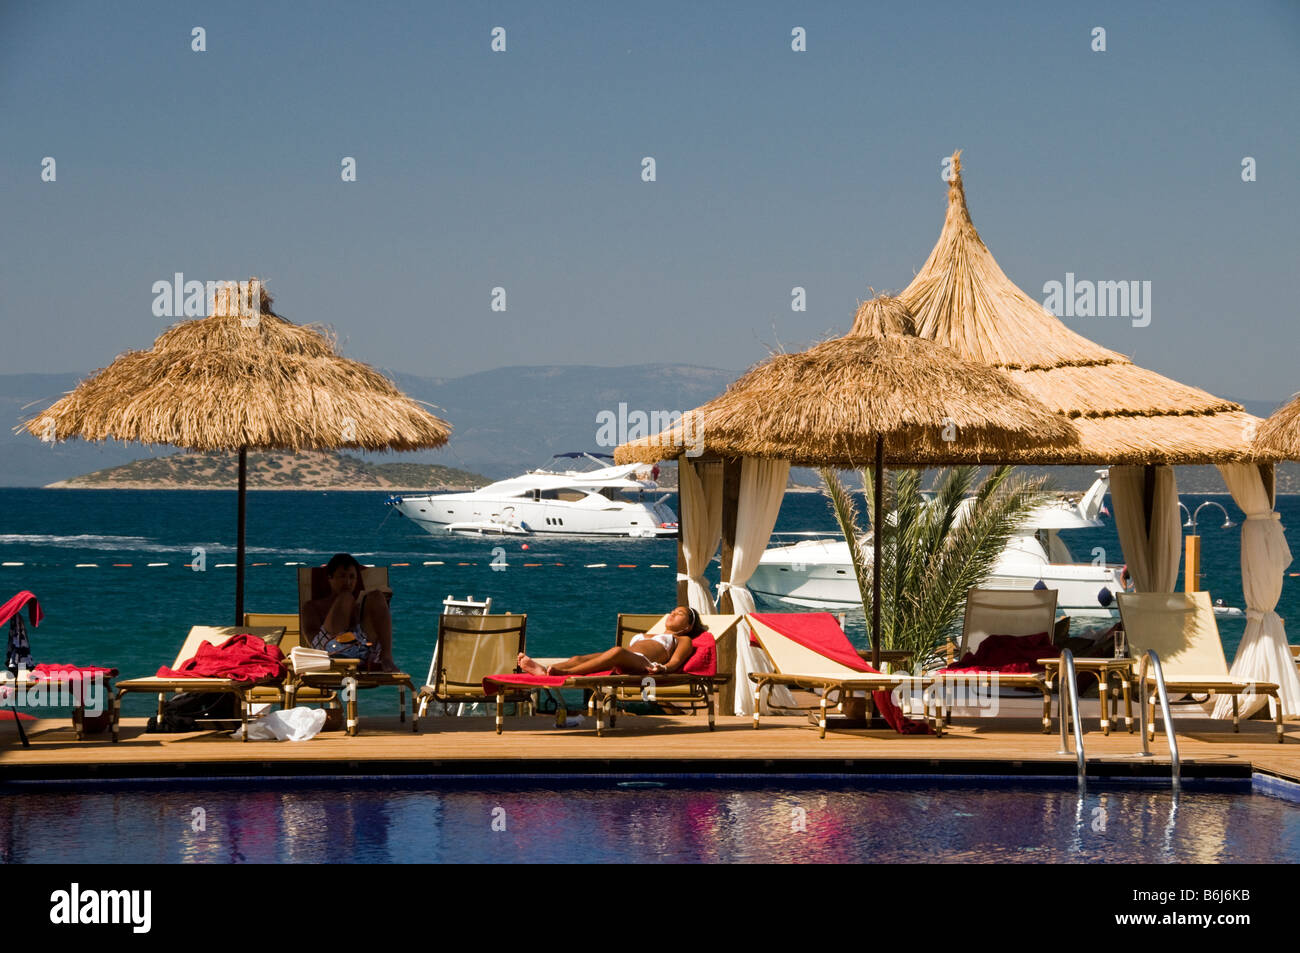 Turkbuku beach clubs, Bodrum Turkey. - Stock Image